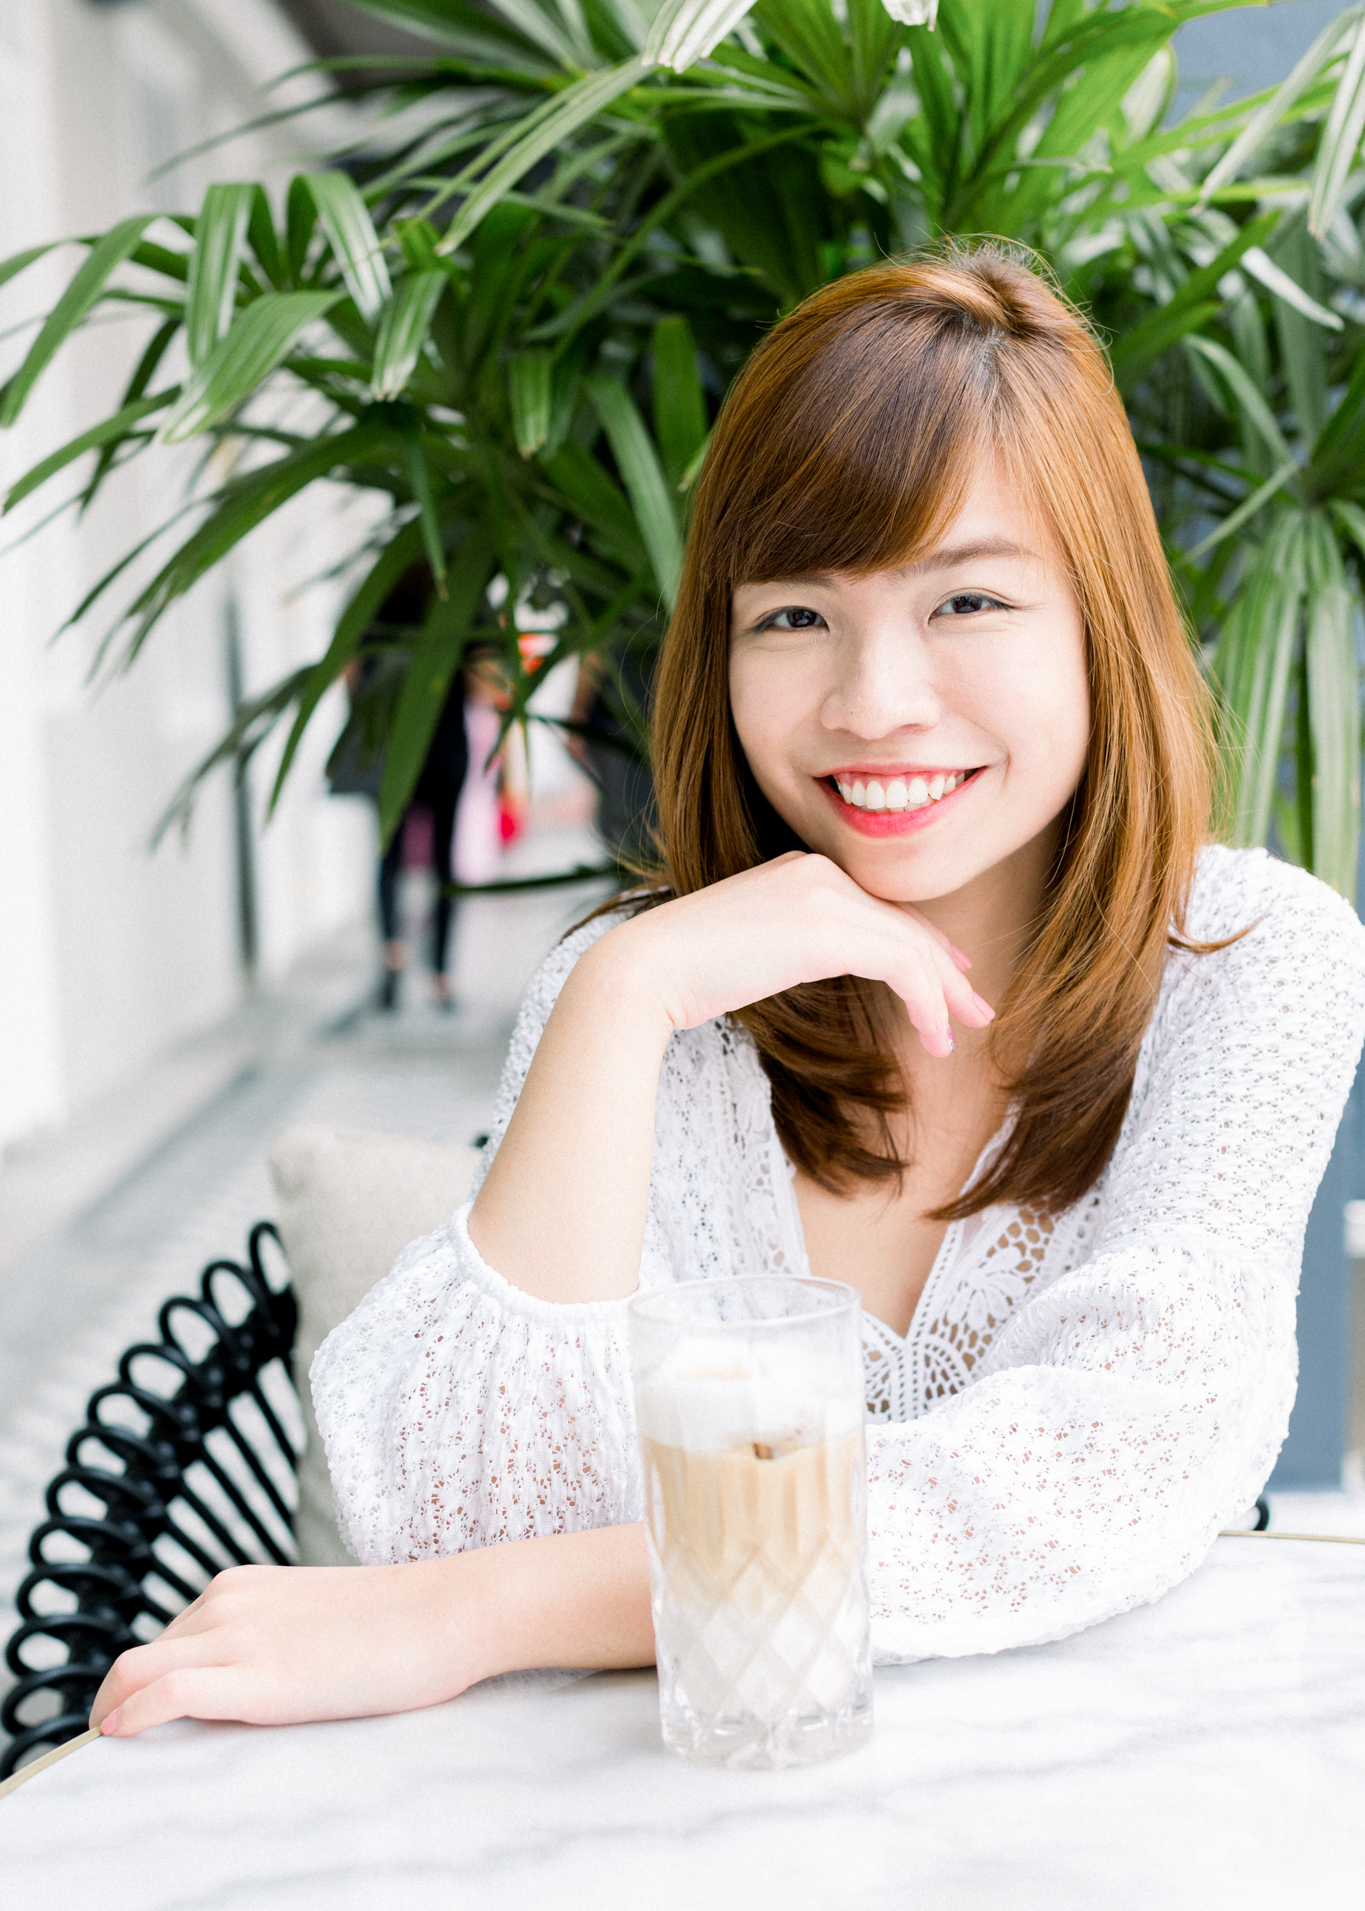 natural light photographer in singapore, expat photographer singapore, branding photos for your website